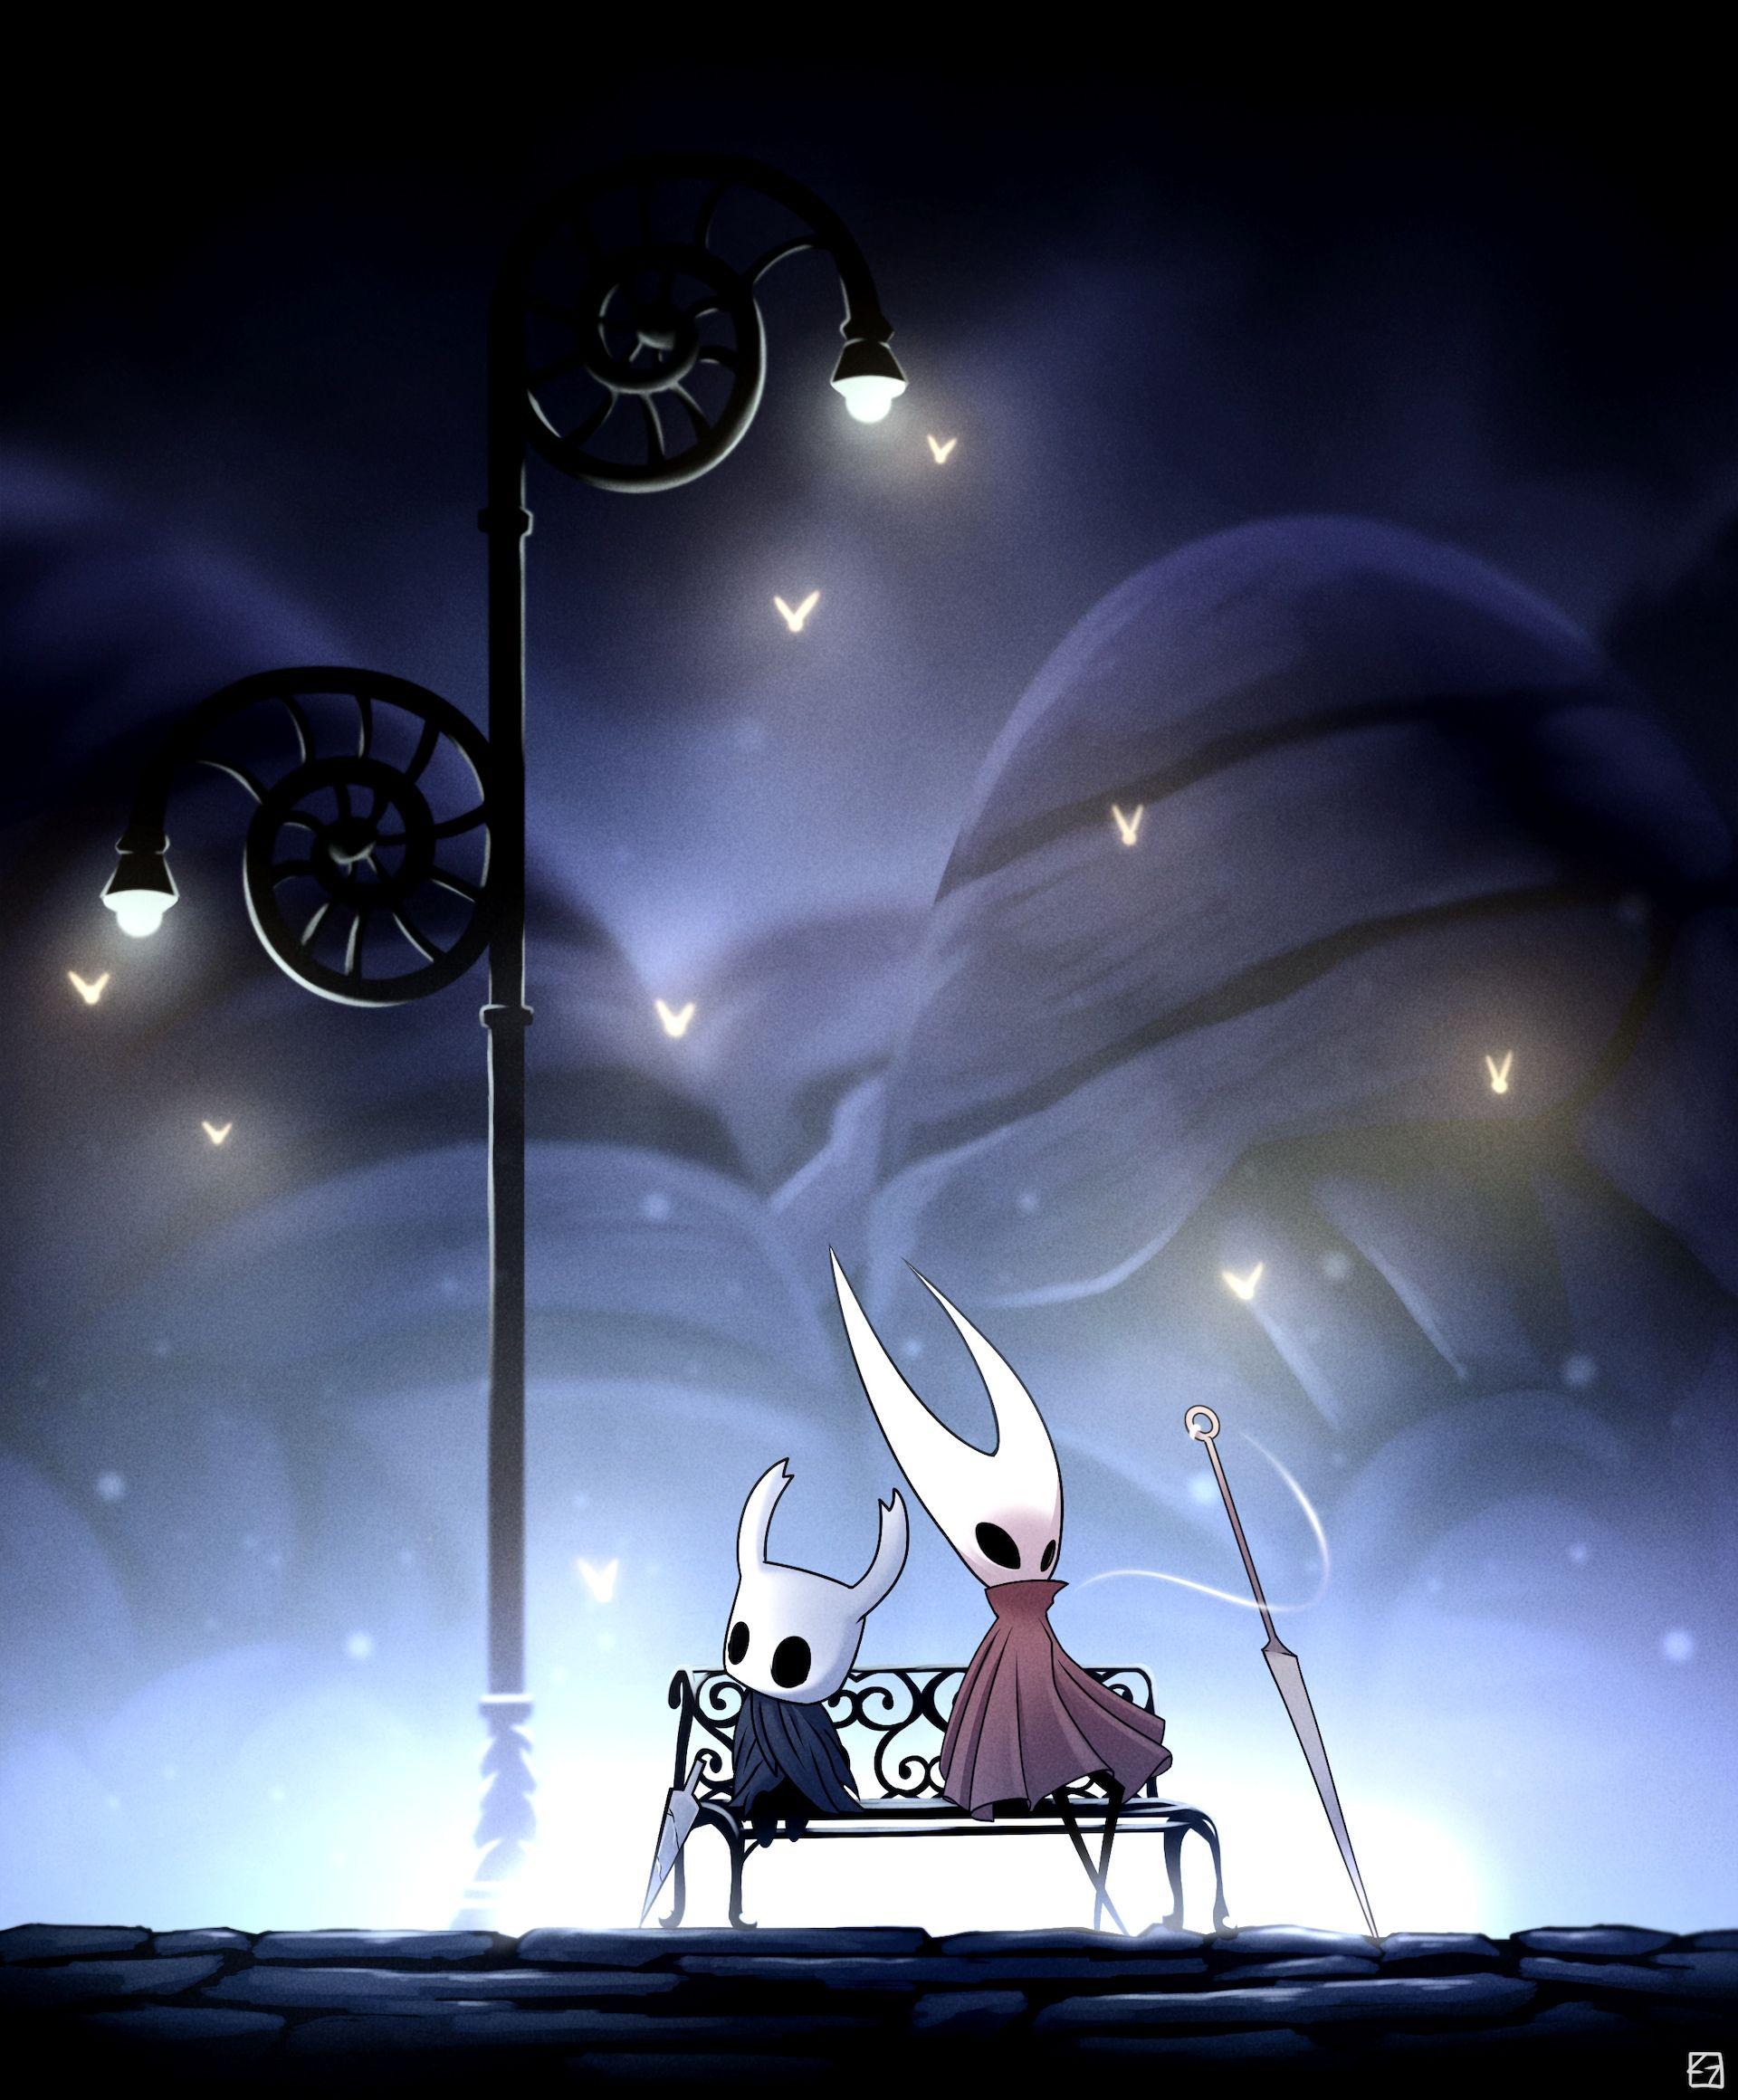 Comunidade Steam Hollow Knight Knight Hollow Night Hollow Art